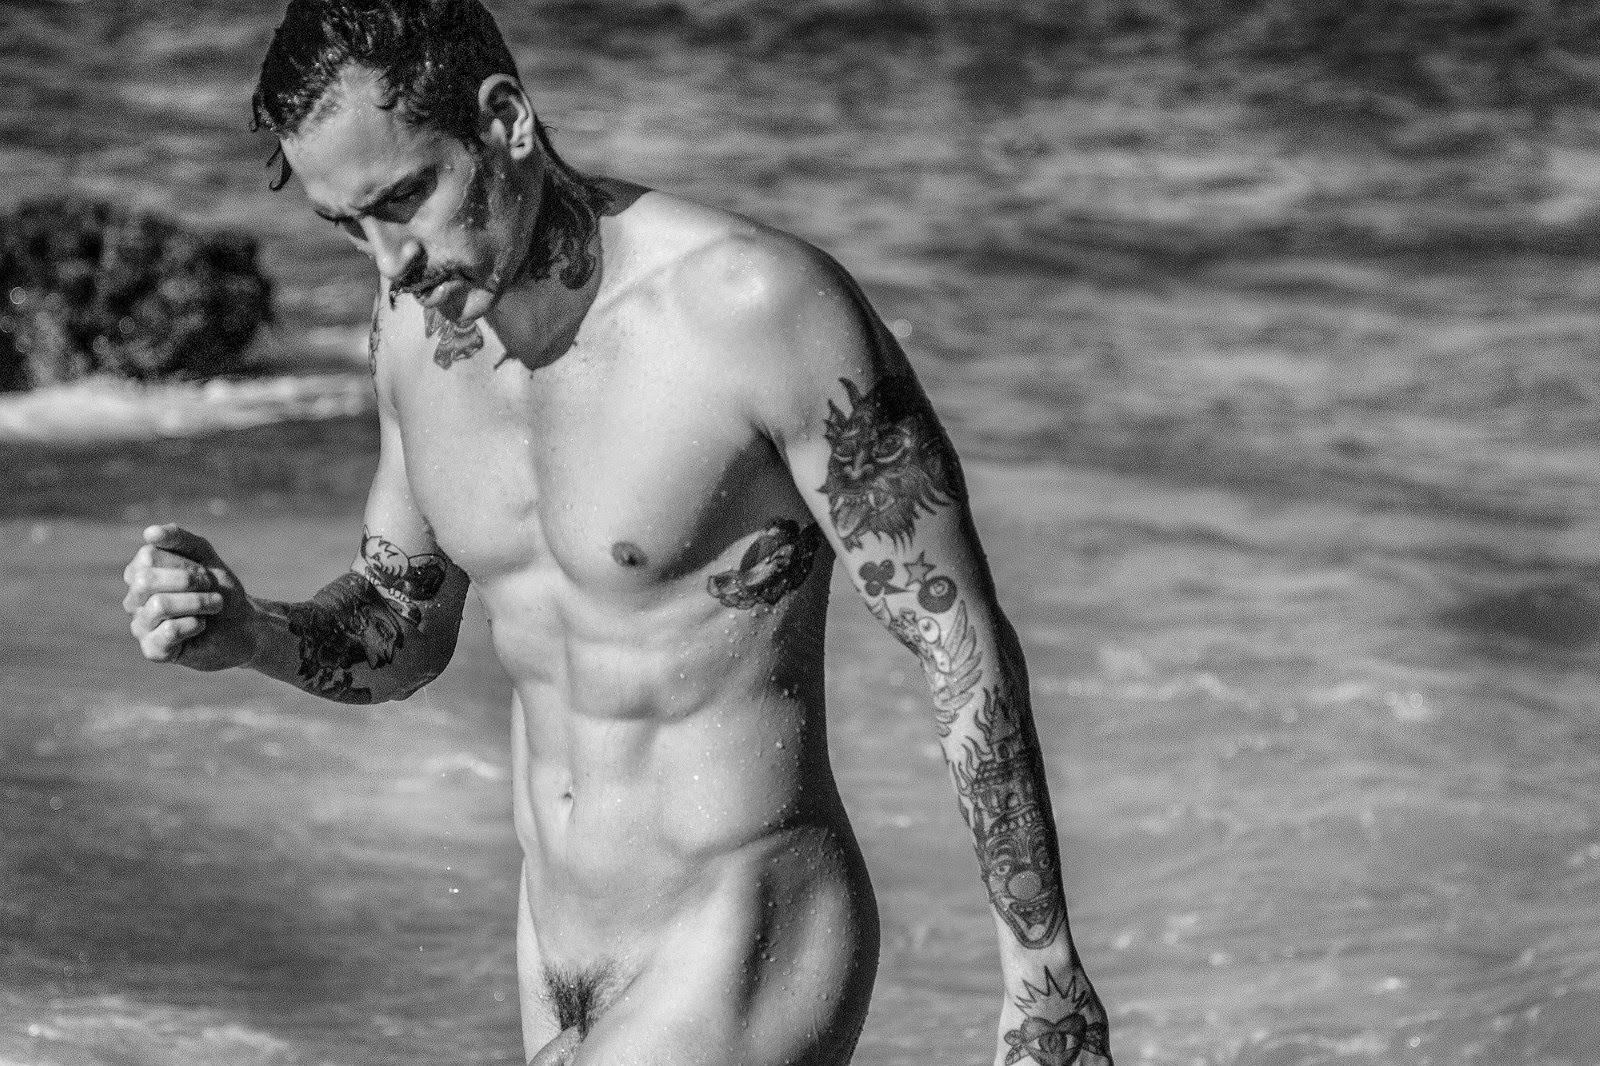 Rafa+Rech+desnudo